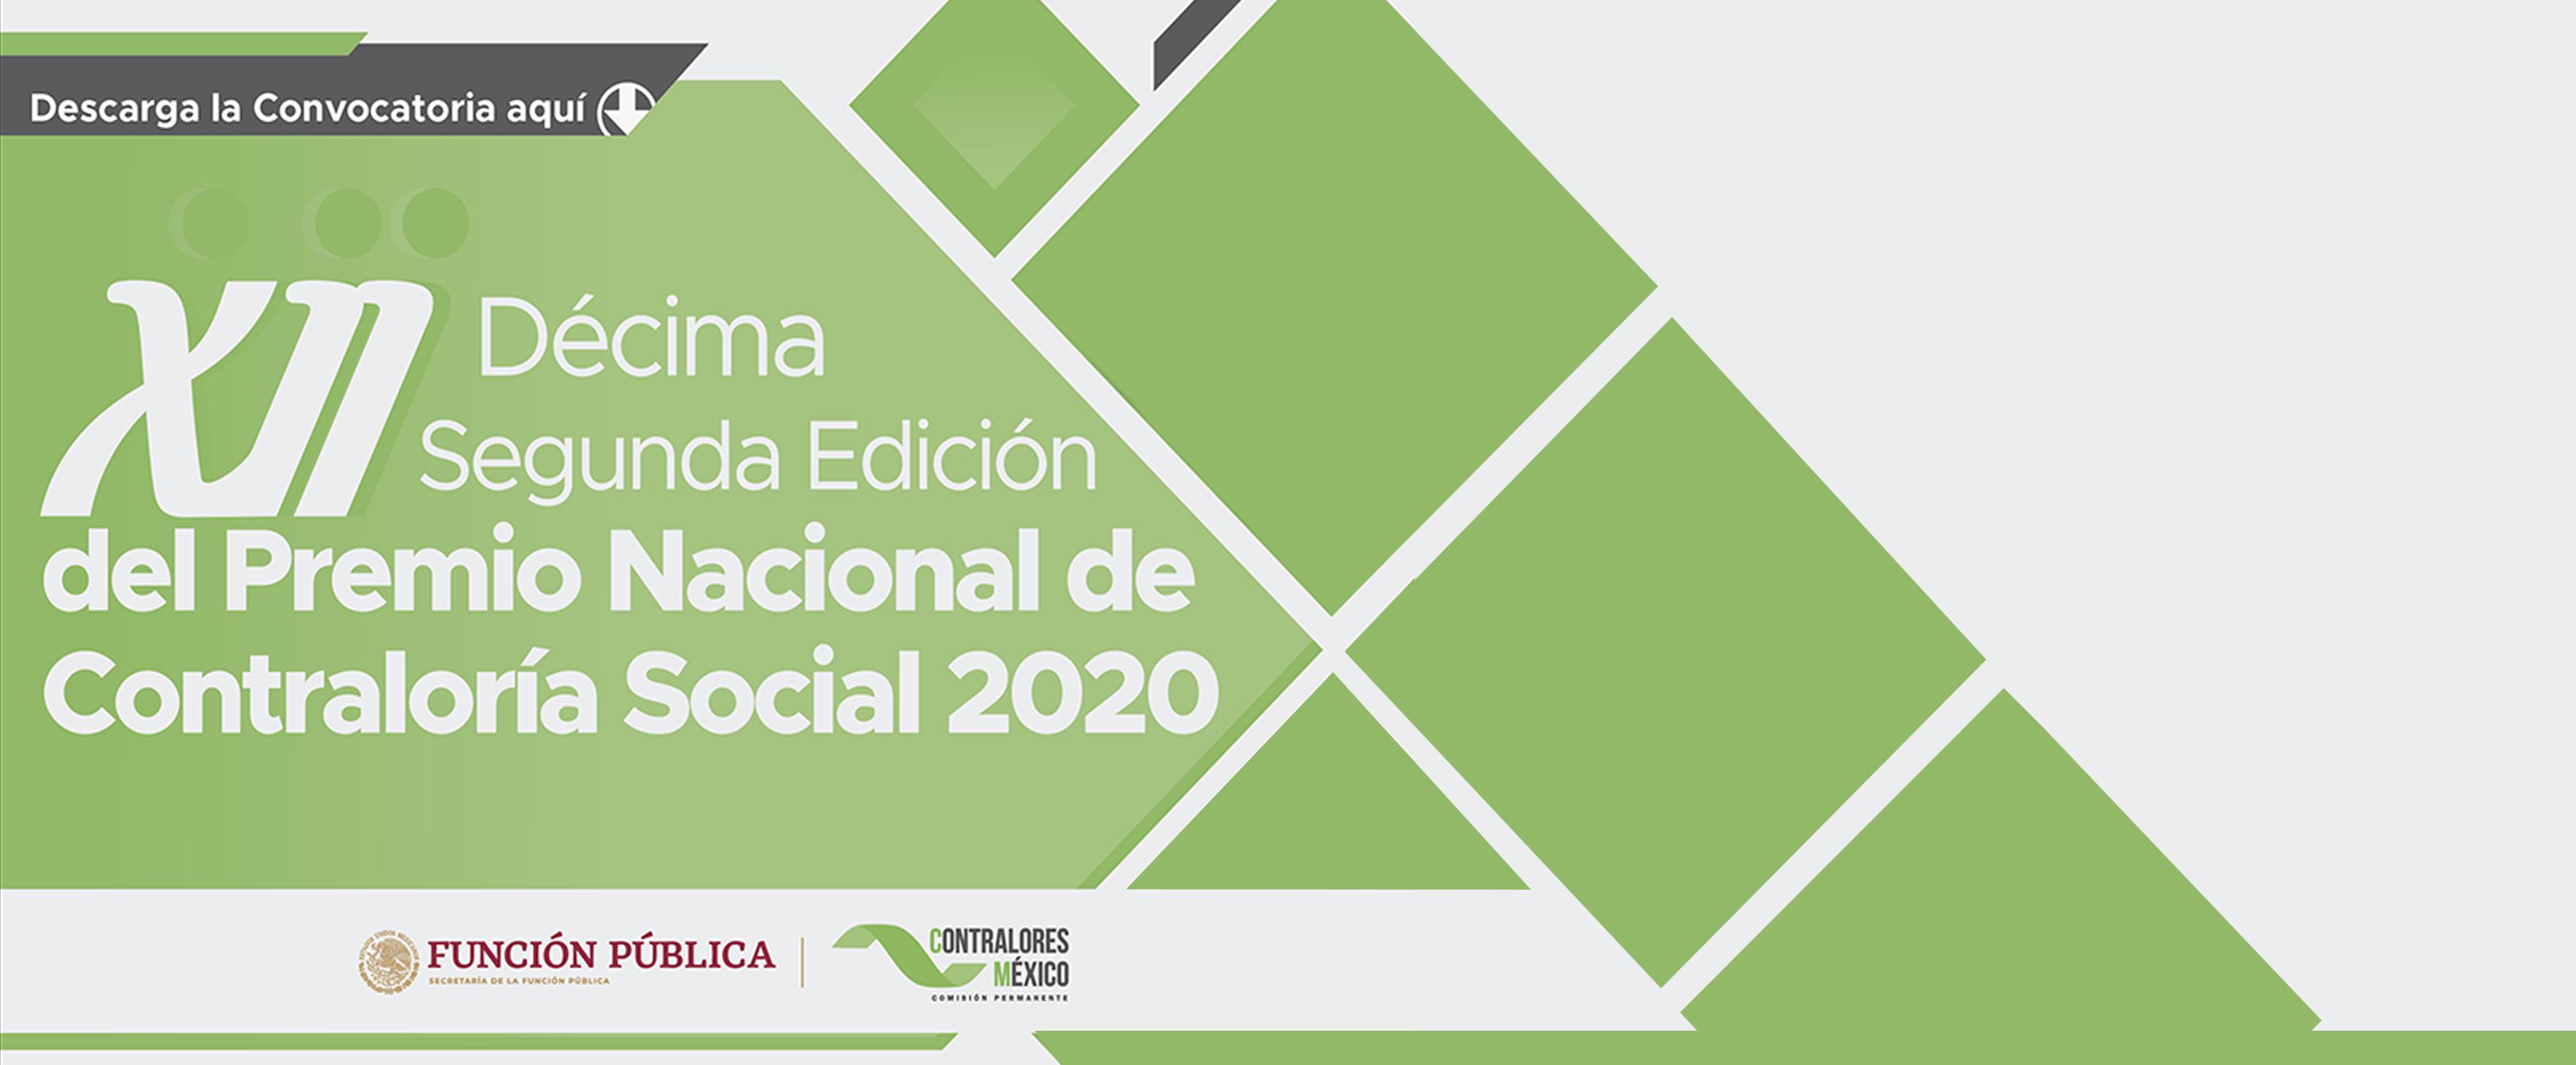 XII Décima Segunda Edición del Premio Nacional de Contraloría Social 2020